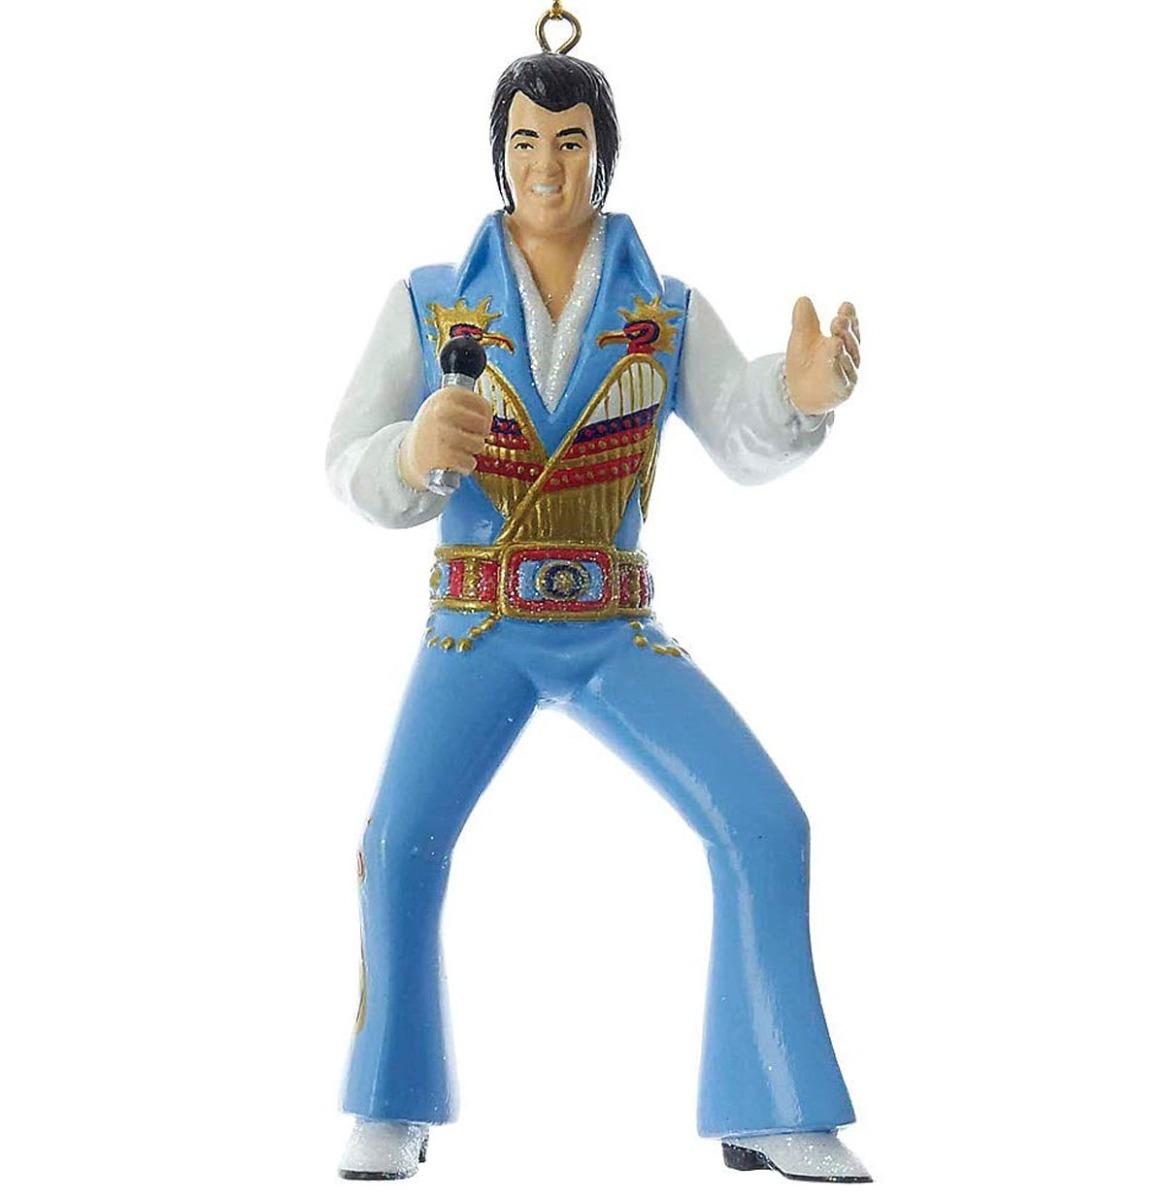 Elvis Presley In Prehistoric Suit Kerst Ornament